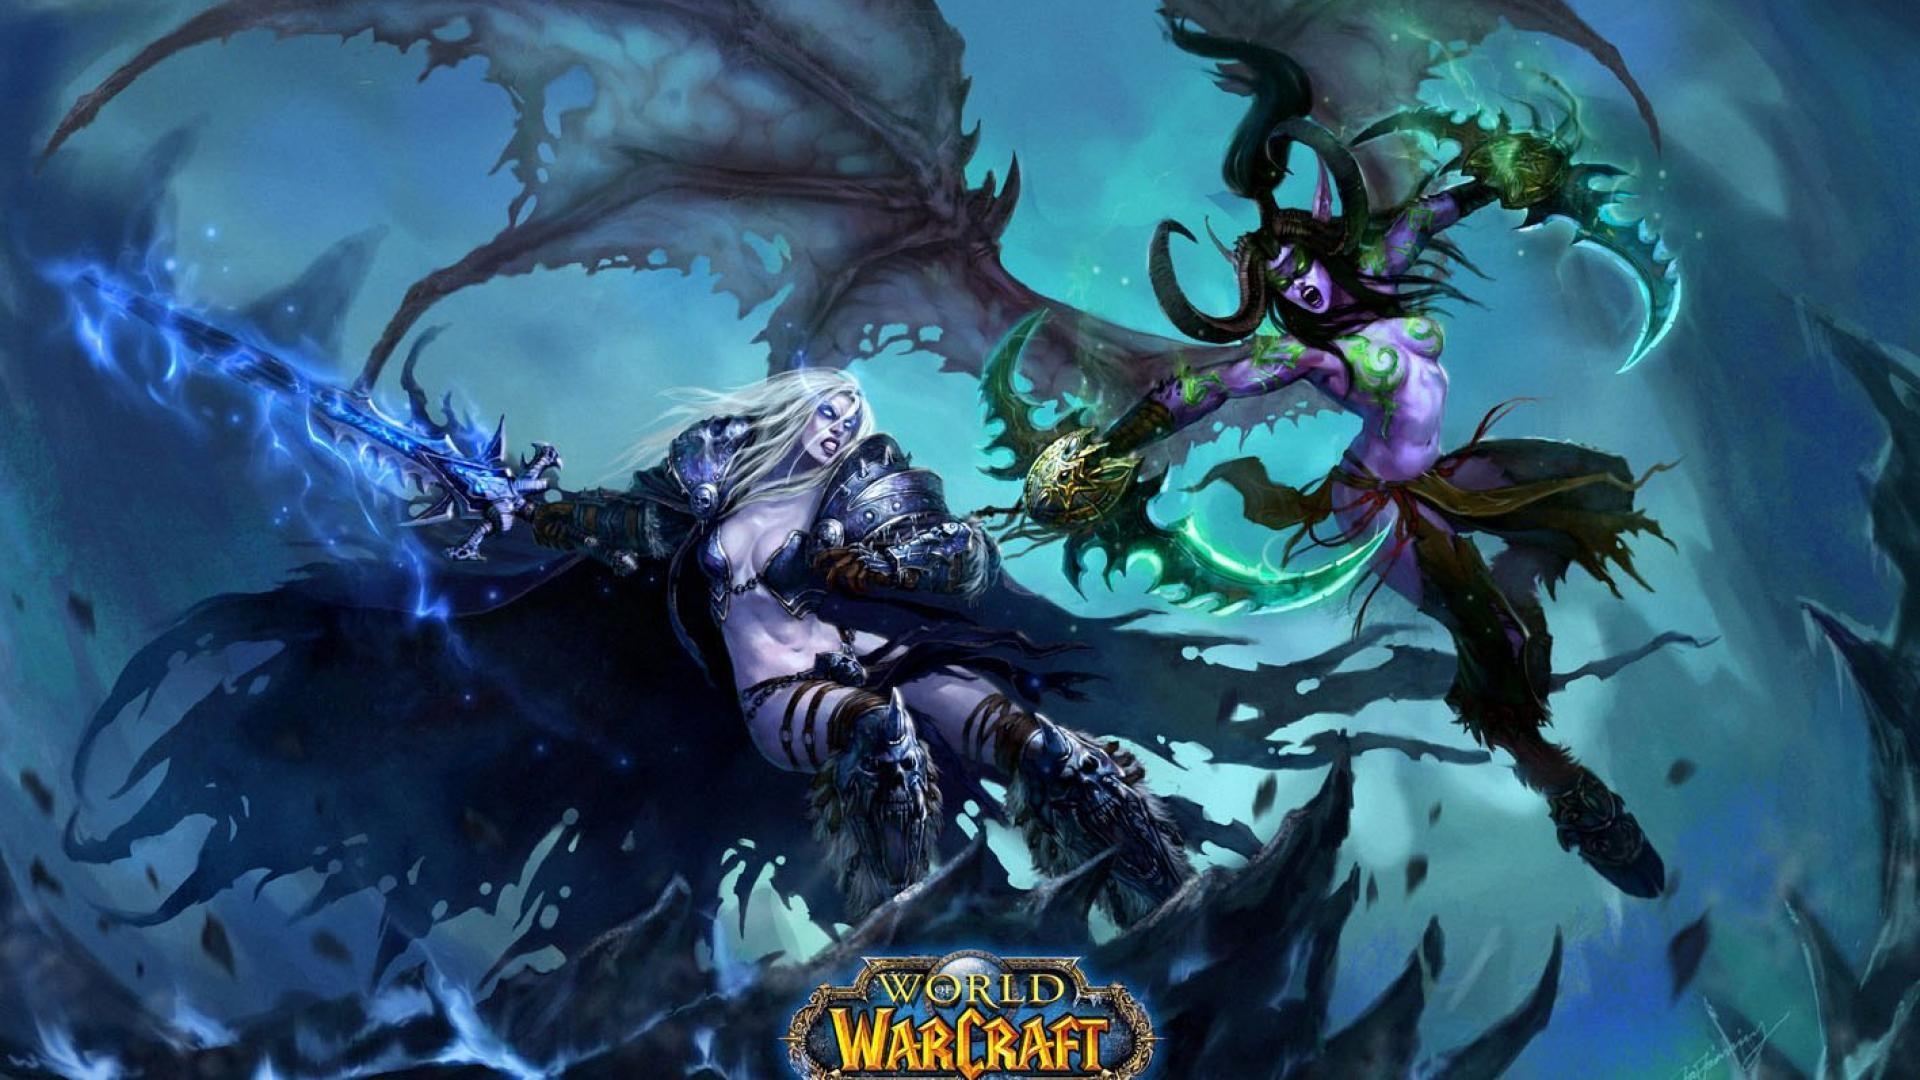 WOW Troll Wallpaper | HD Wallpapers | Pinterest | Warcraft legion, Wallpaper  and Hd wallpaper